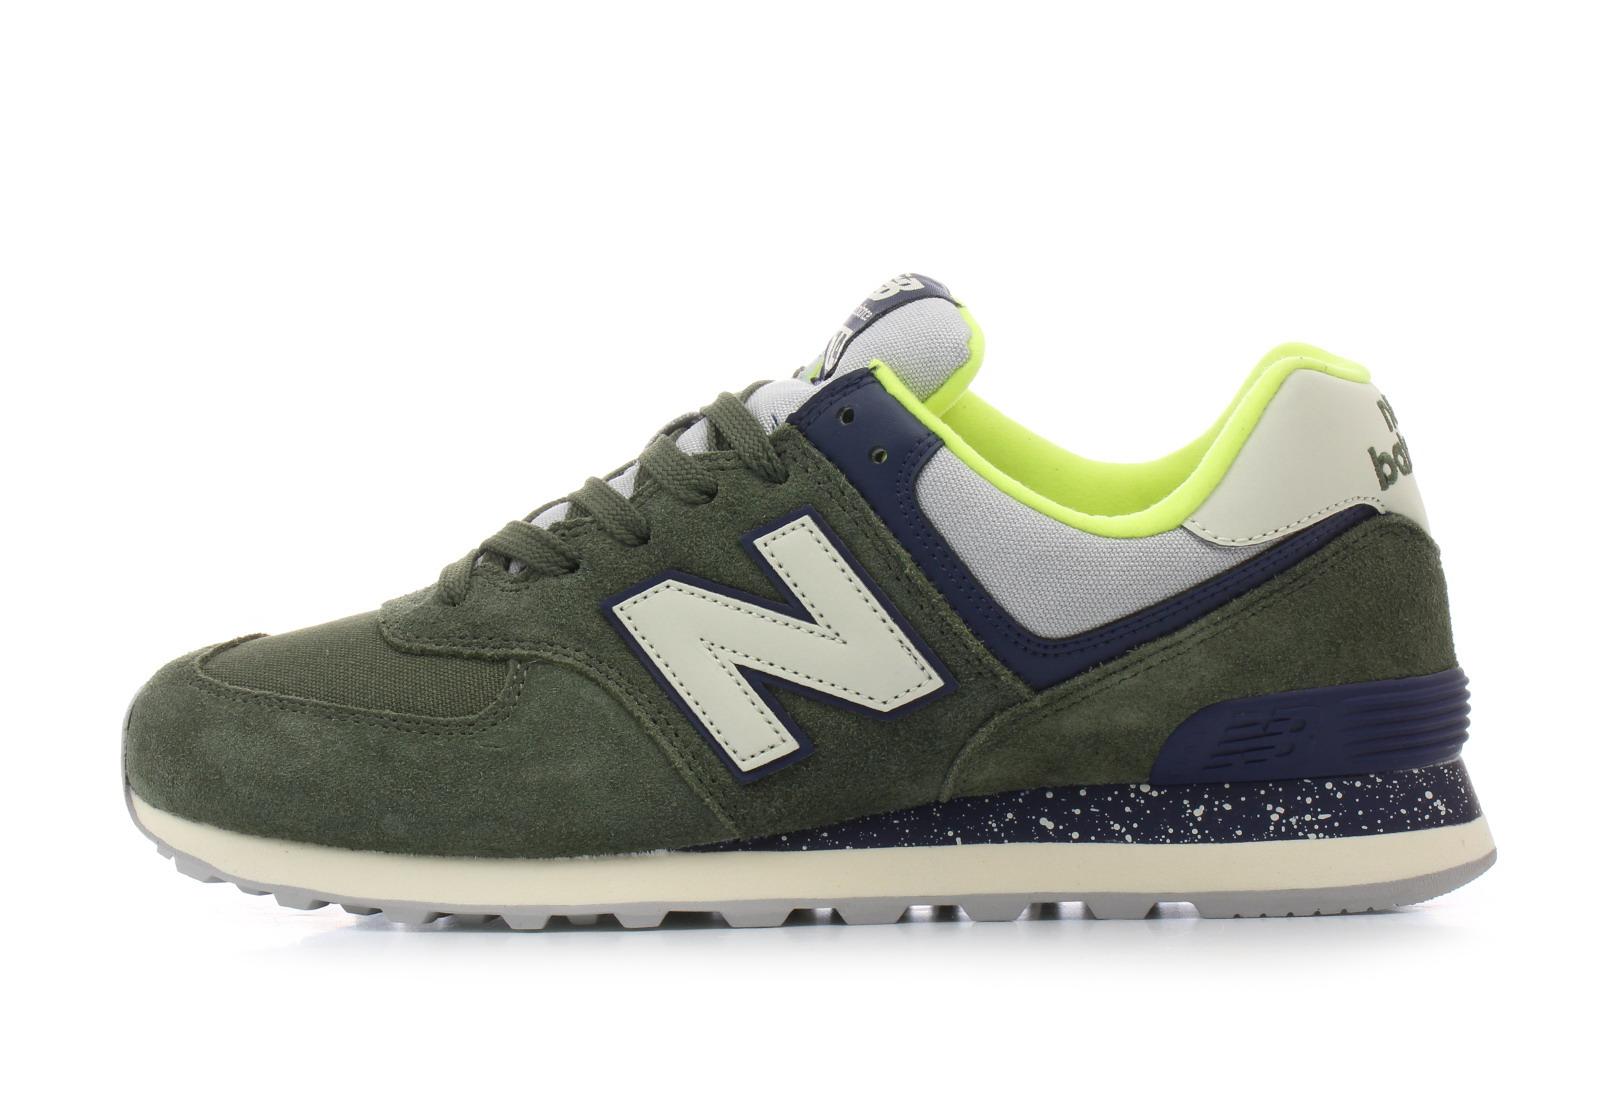 e58ade8141b New Balance Niske Cipele Zelene Cipele - Ml574 - Office Shoes - Online  trgovina obuće